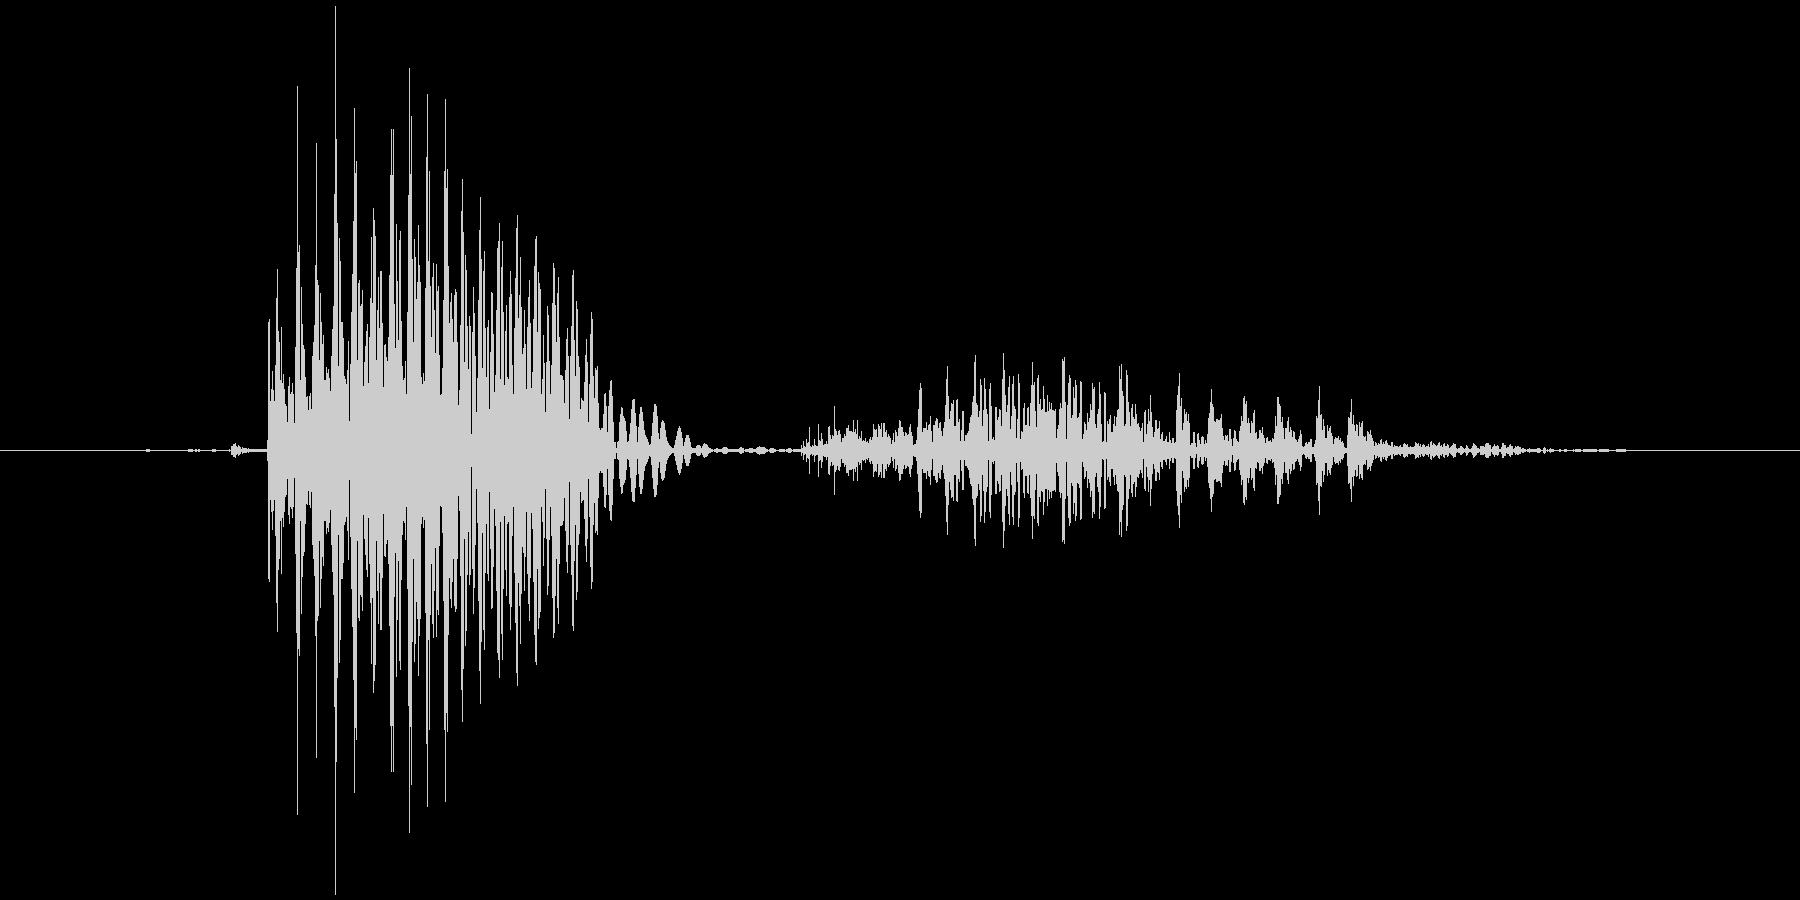 「April」英語発音の未再生の波形